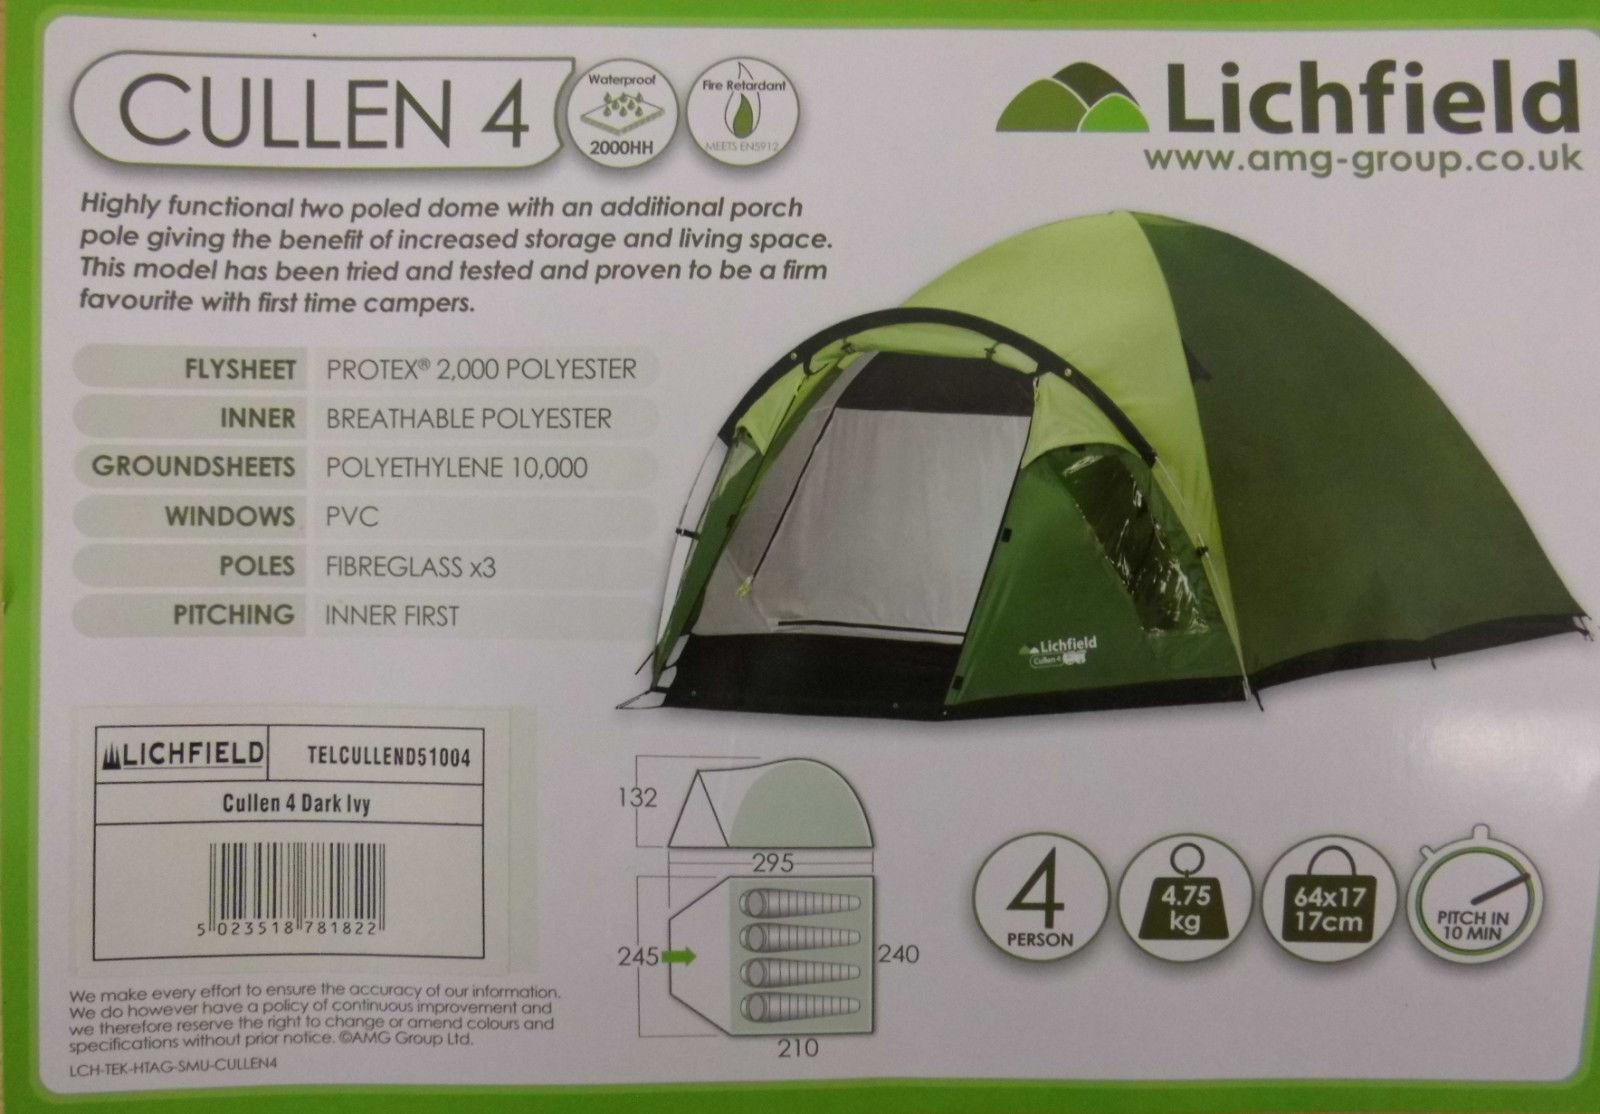 Lichfield Campingzelt Cullen 4, 4, 4, 210x240x130 365ca9